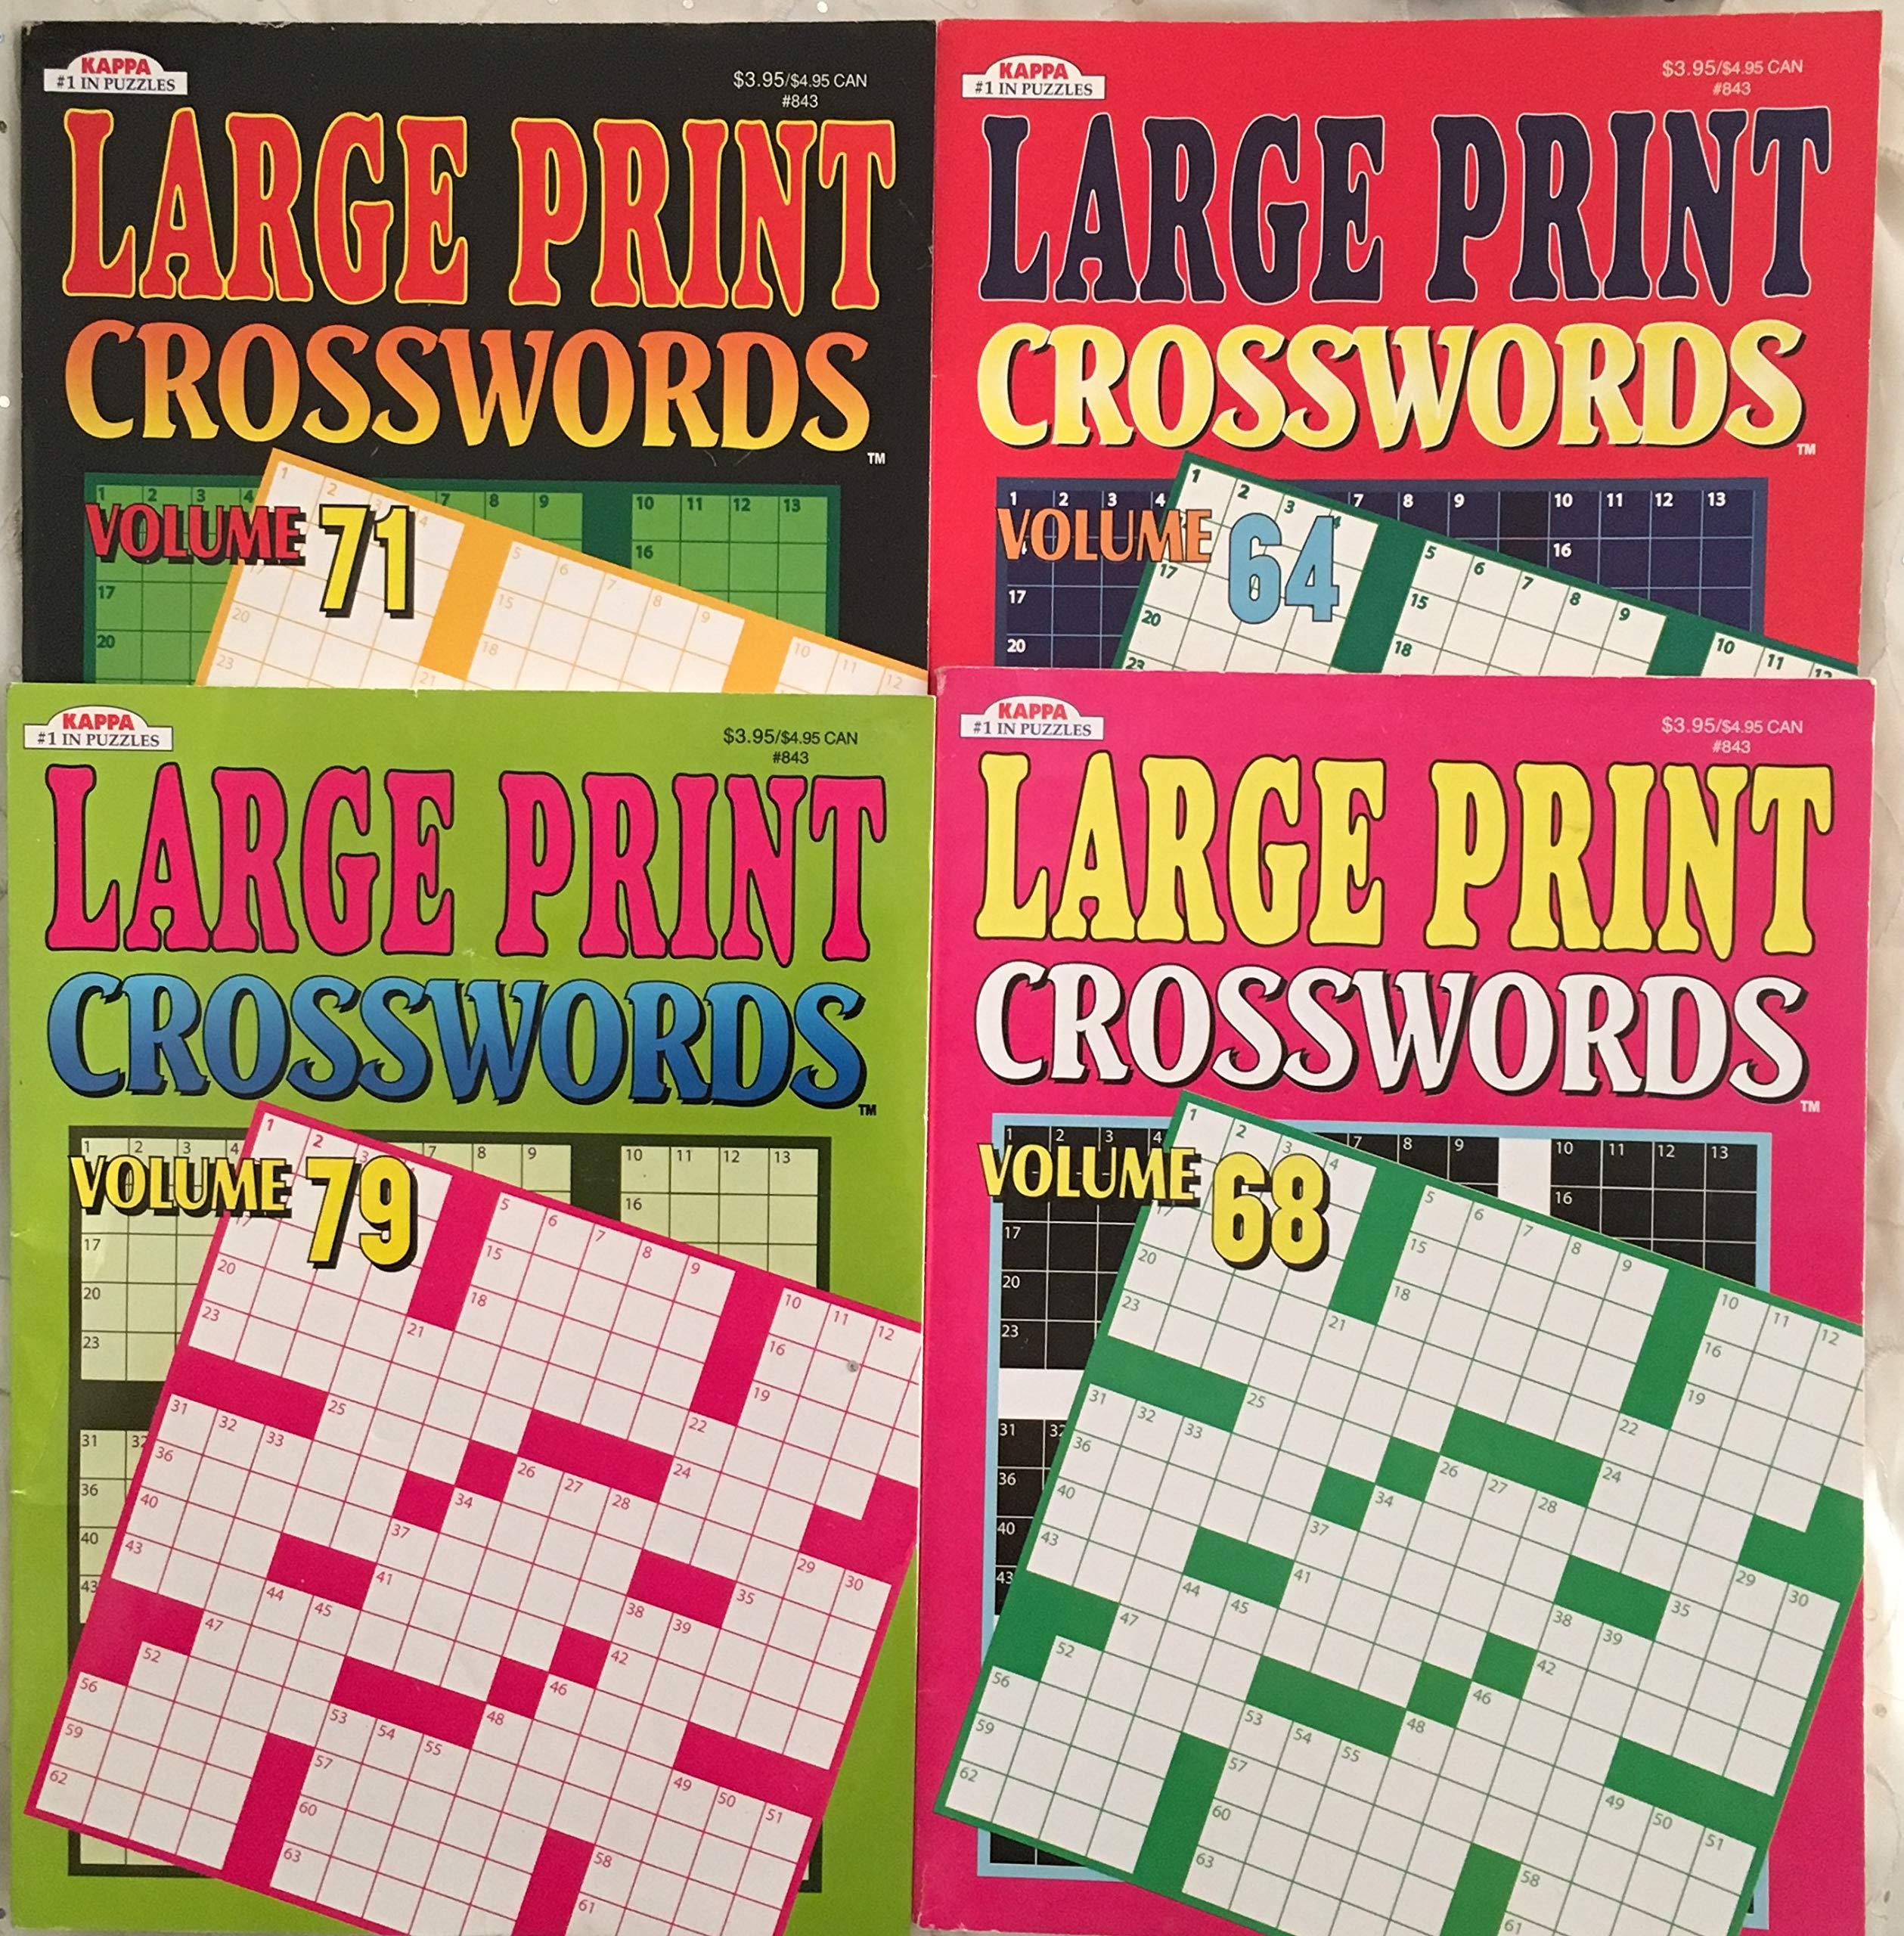 67e96959a3 Lot of (4) Kappa LARGE PRINT Crosswords Full Size Puzzle Books ...